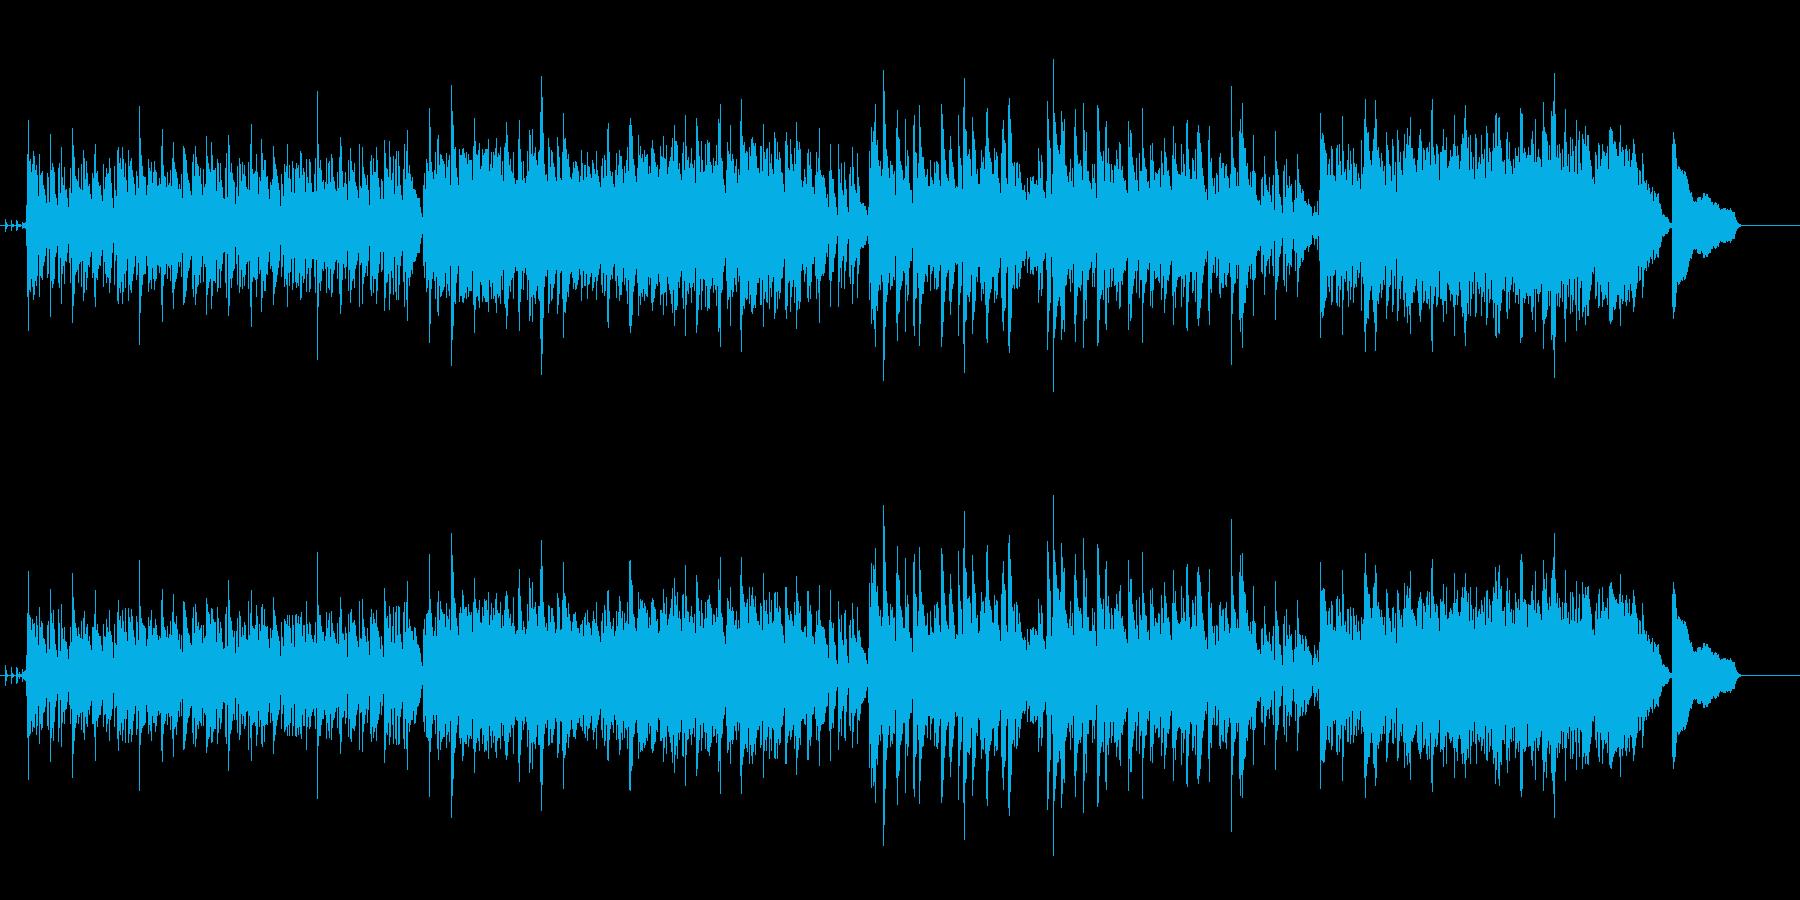 FineRain_ (jazz 1)の再生済みの波形